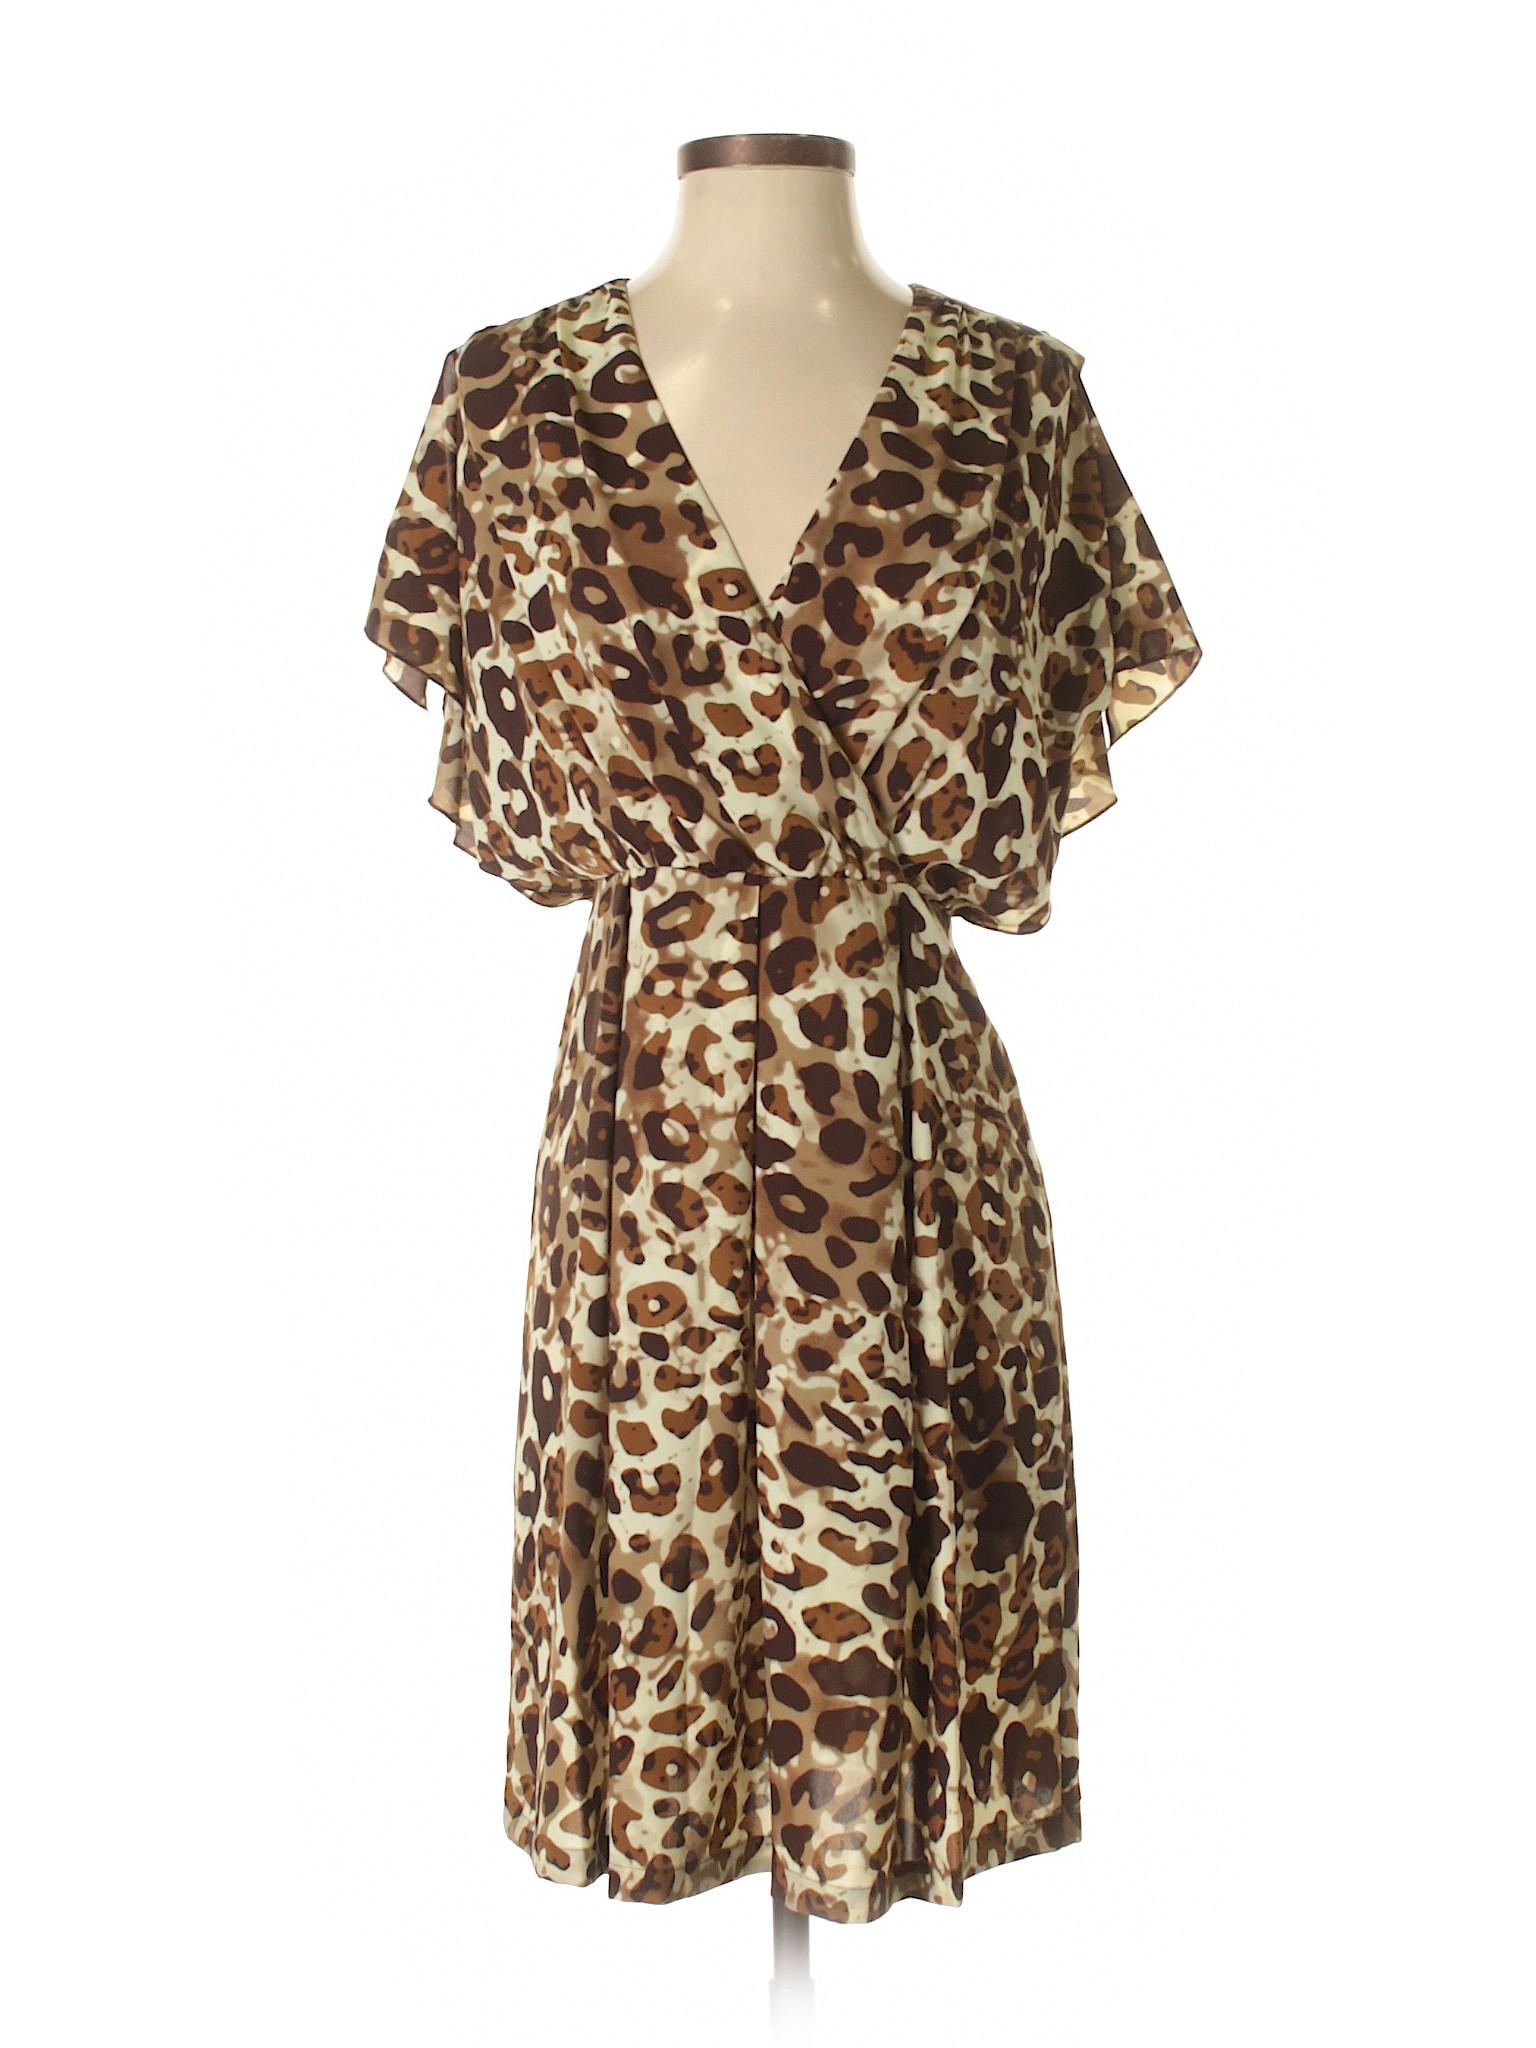 Selling Klein Calvin Selling Dress Calvin Casual Pz6Ycq4w